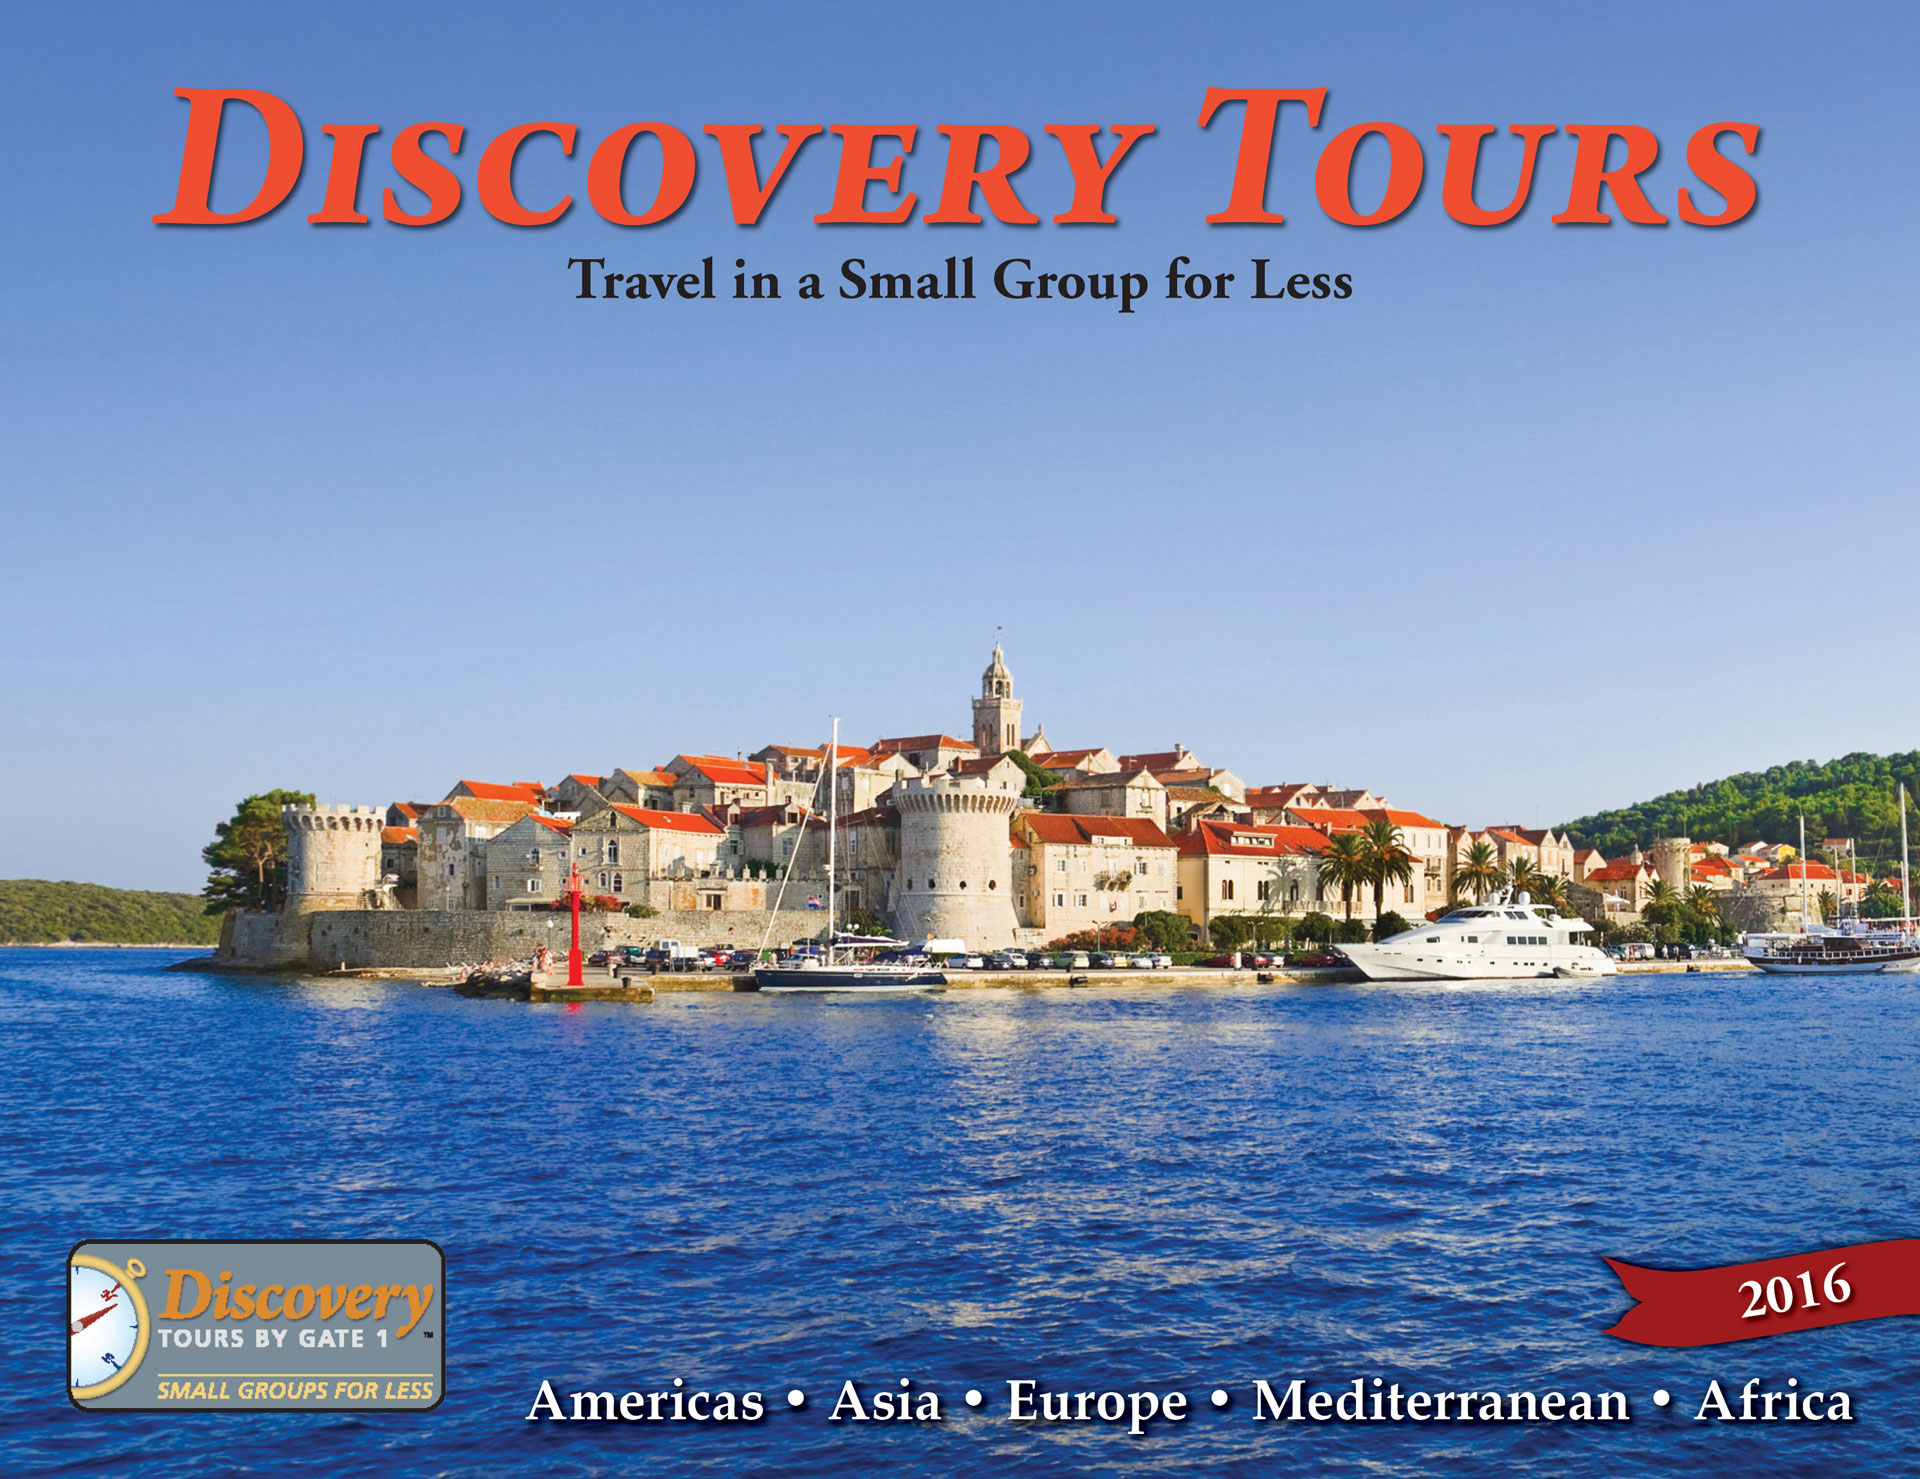 Discorvery Tours